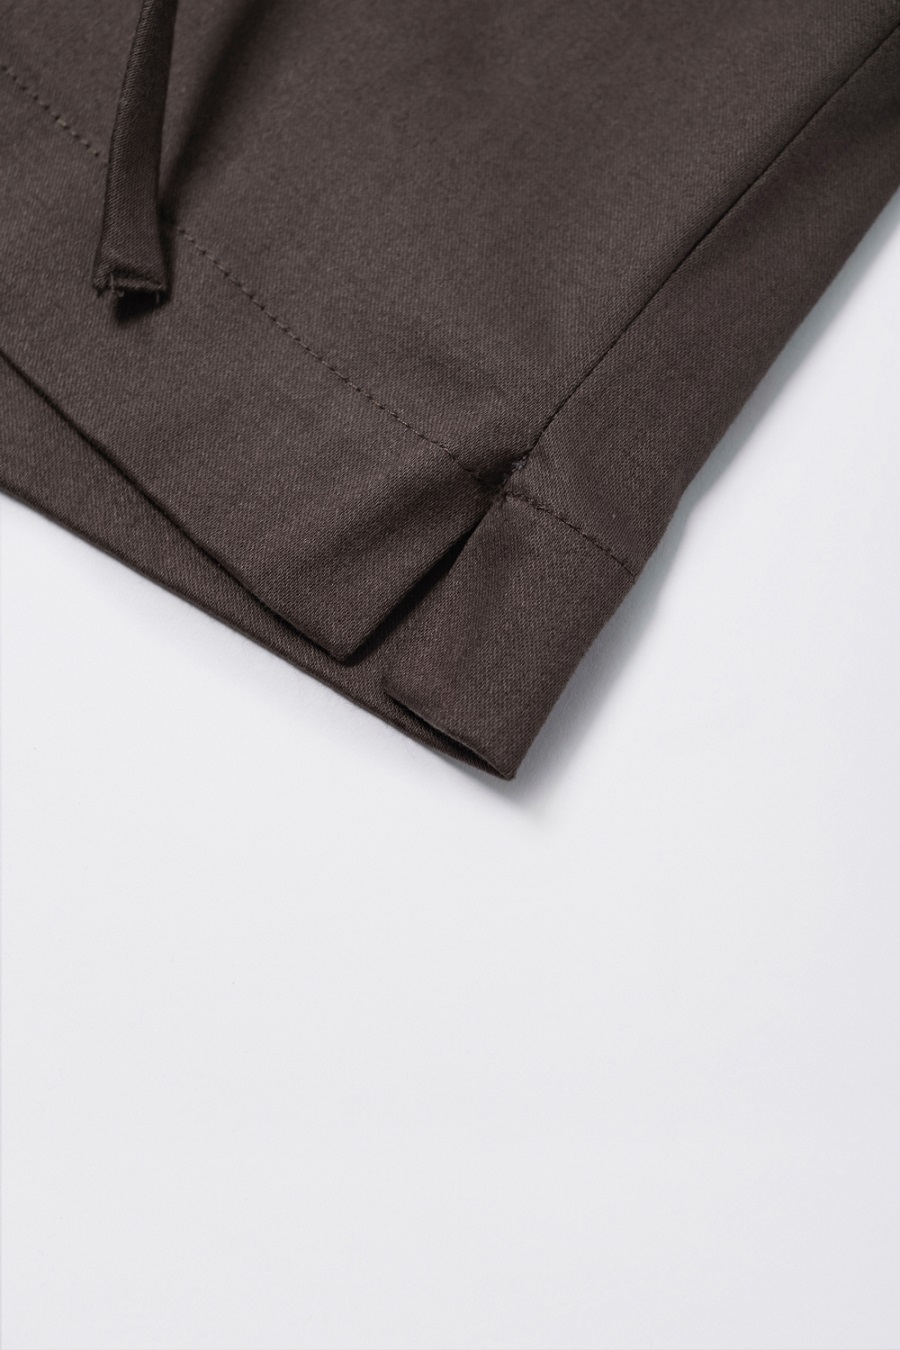 Camisa PIET Utility Bowling Shirt Deep Green